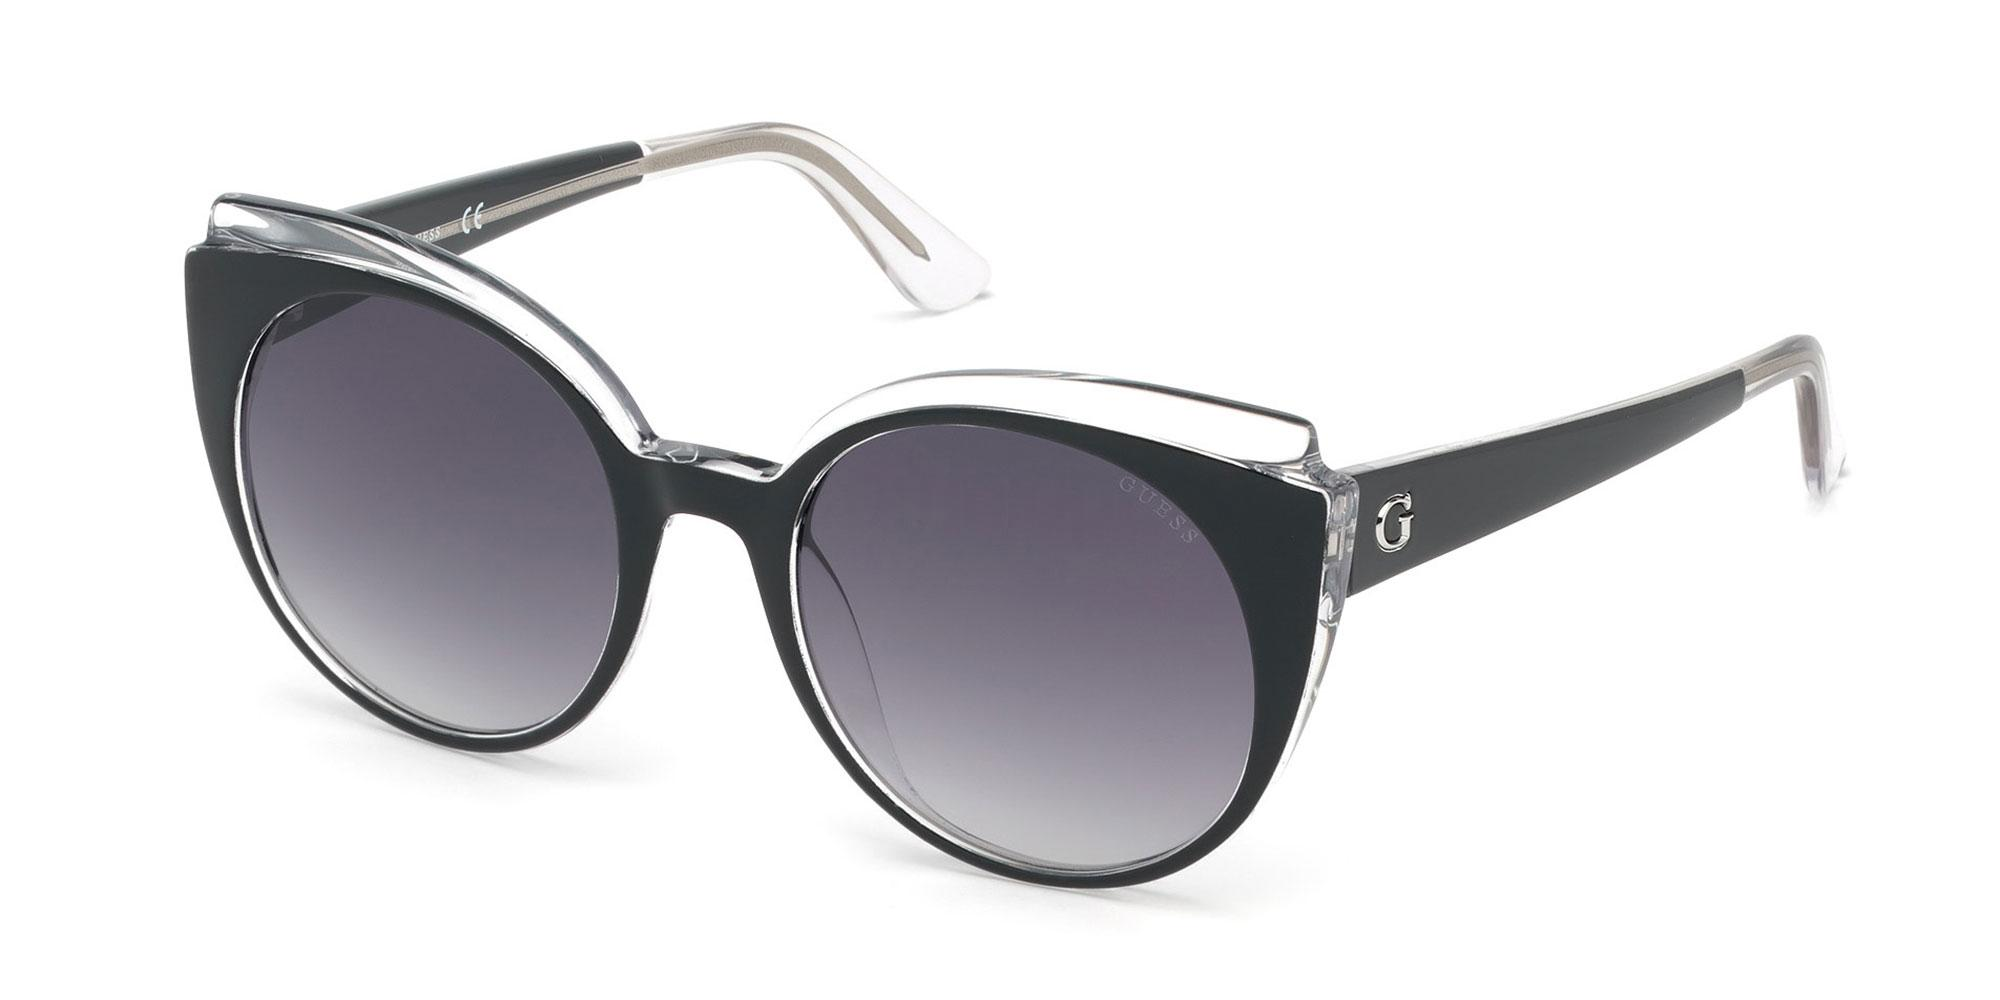 03B GU7591 Sunglasses, Guess